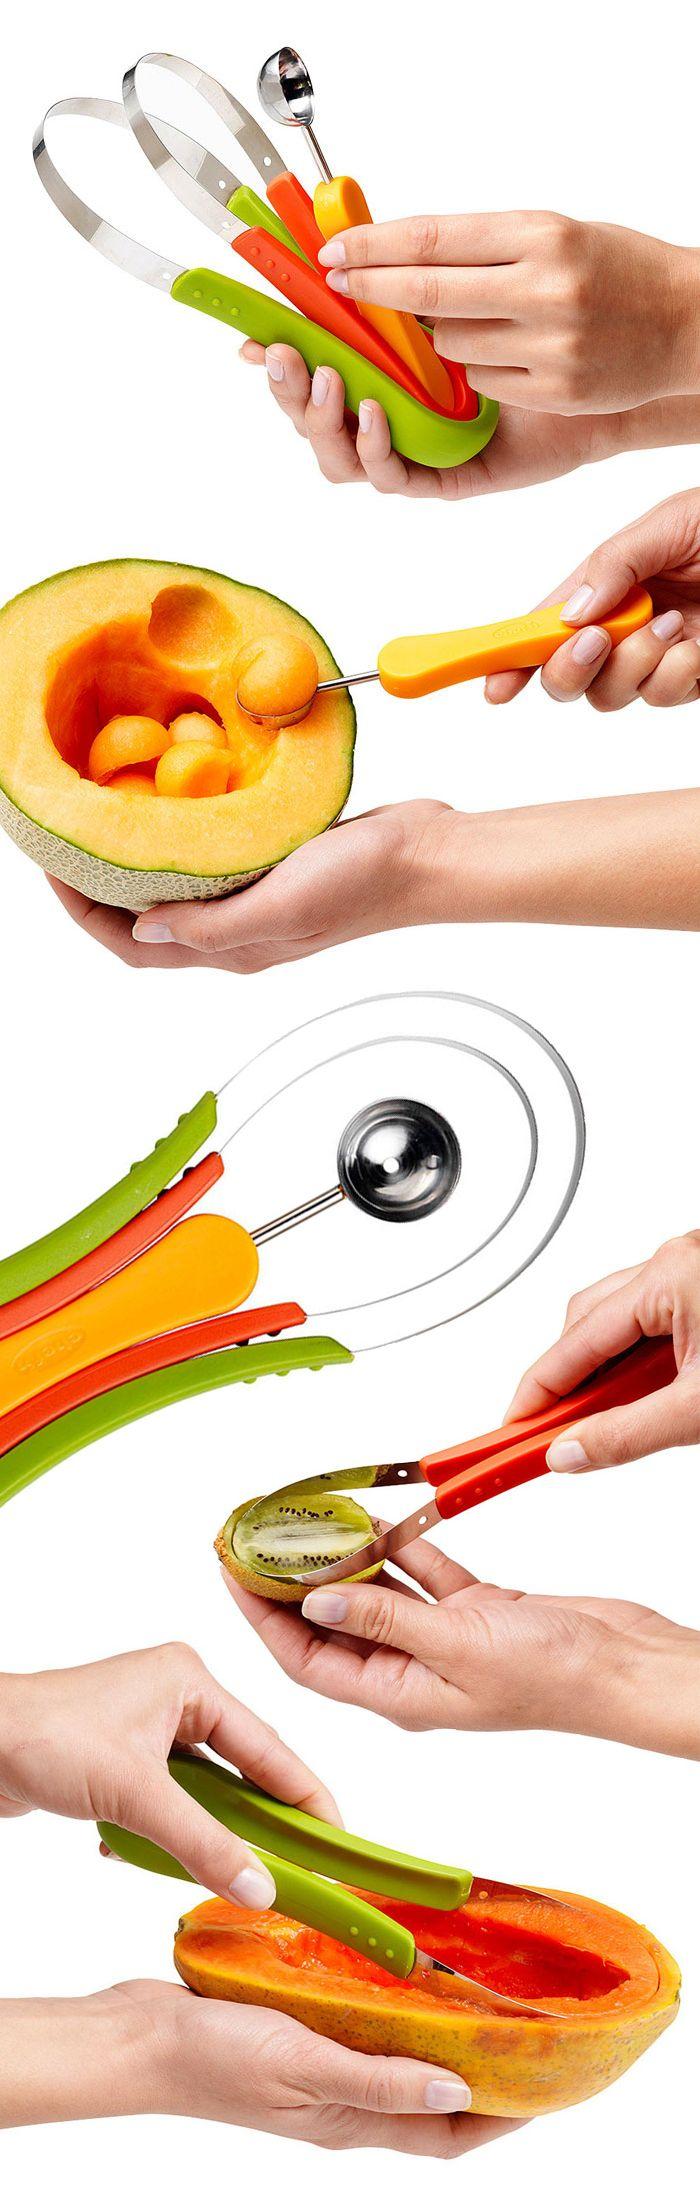 Fruit scoop set with melon baller - makes preparing fruit salad easy #product_design